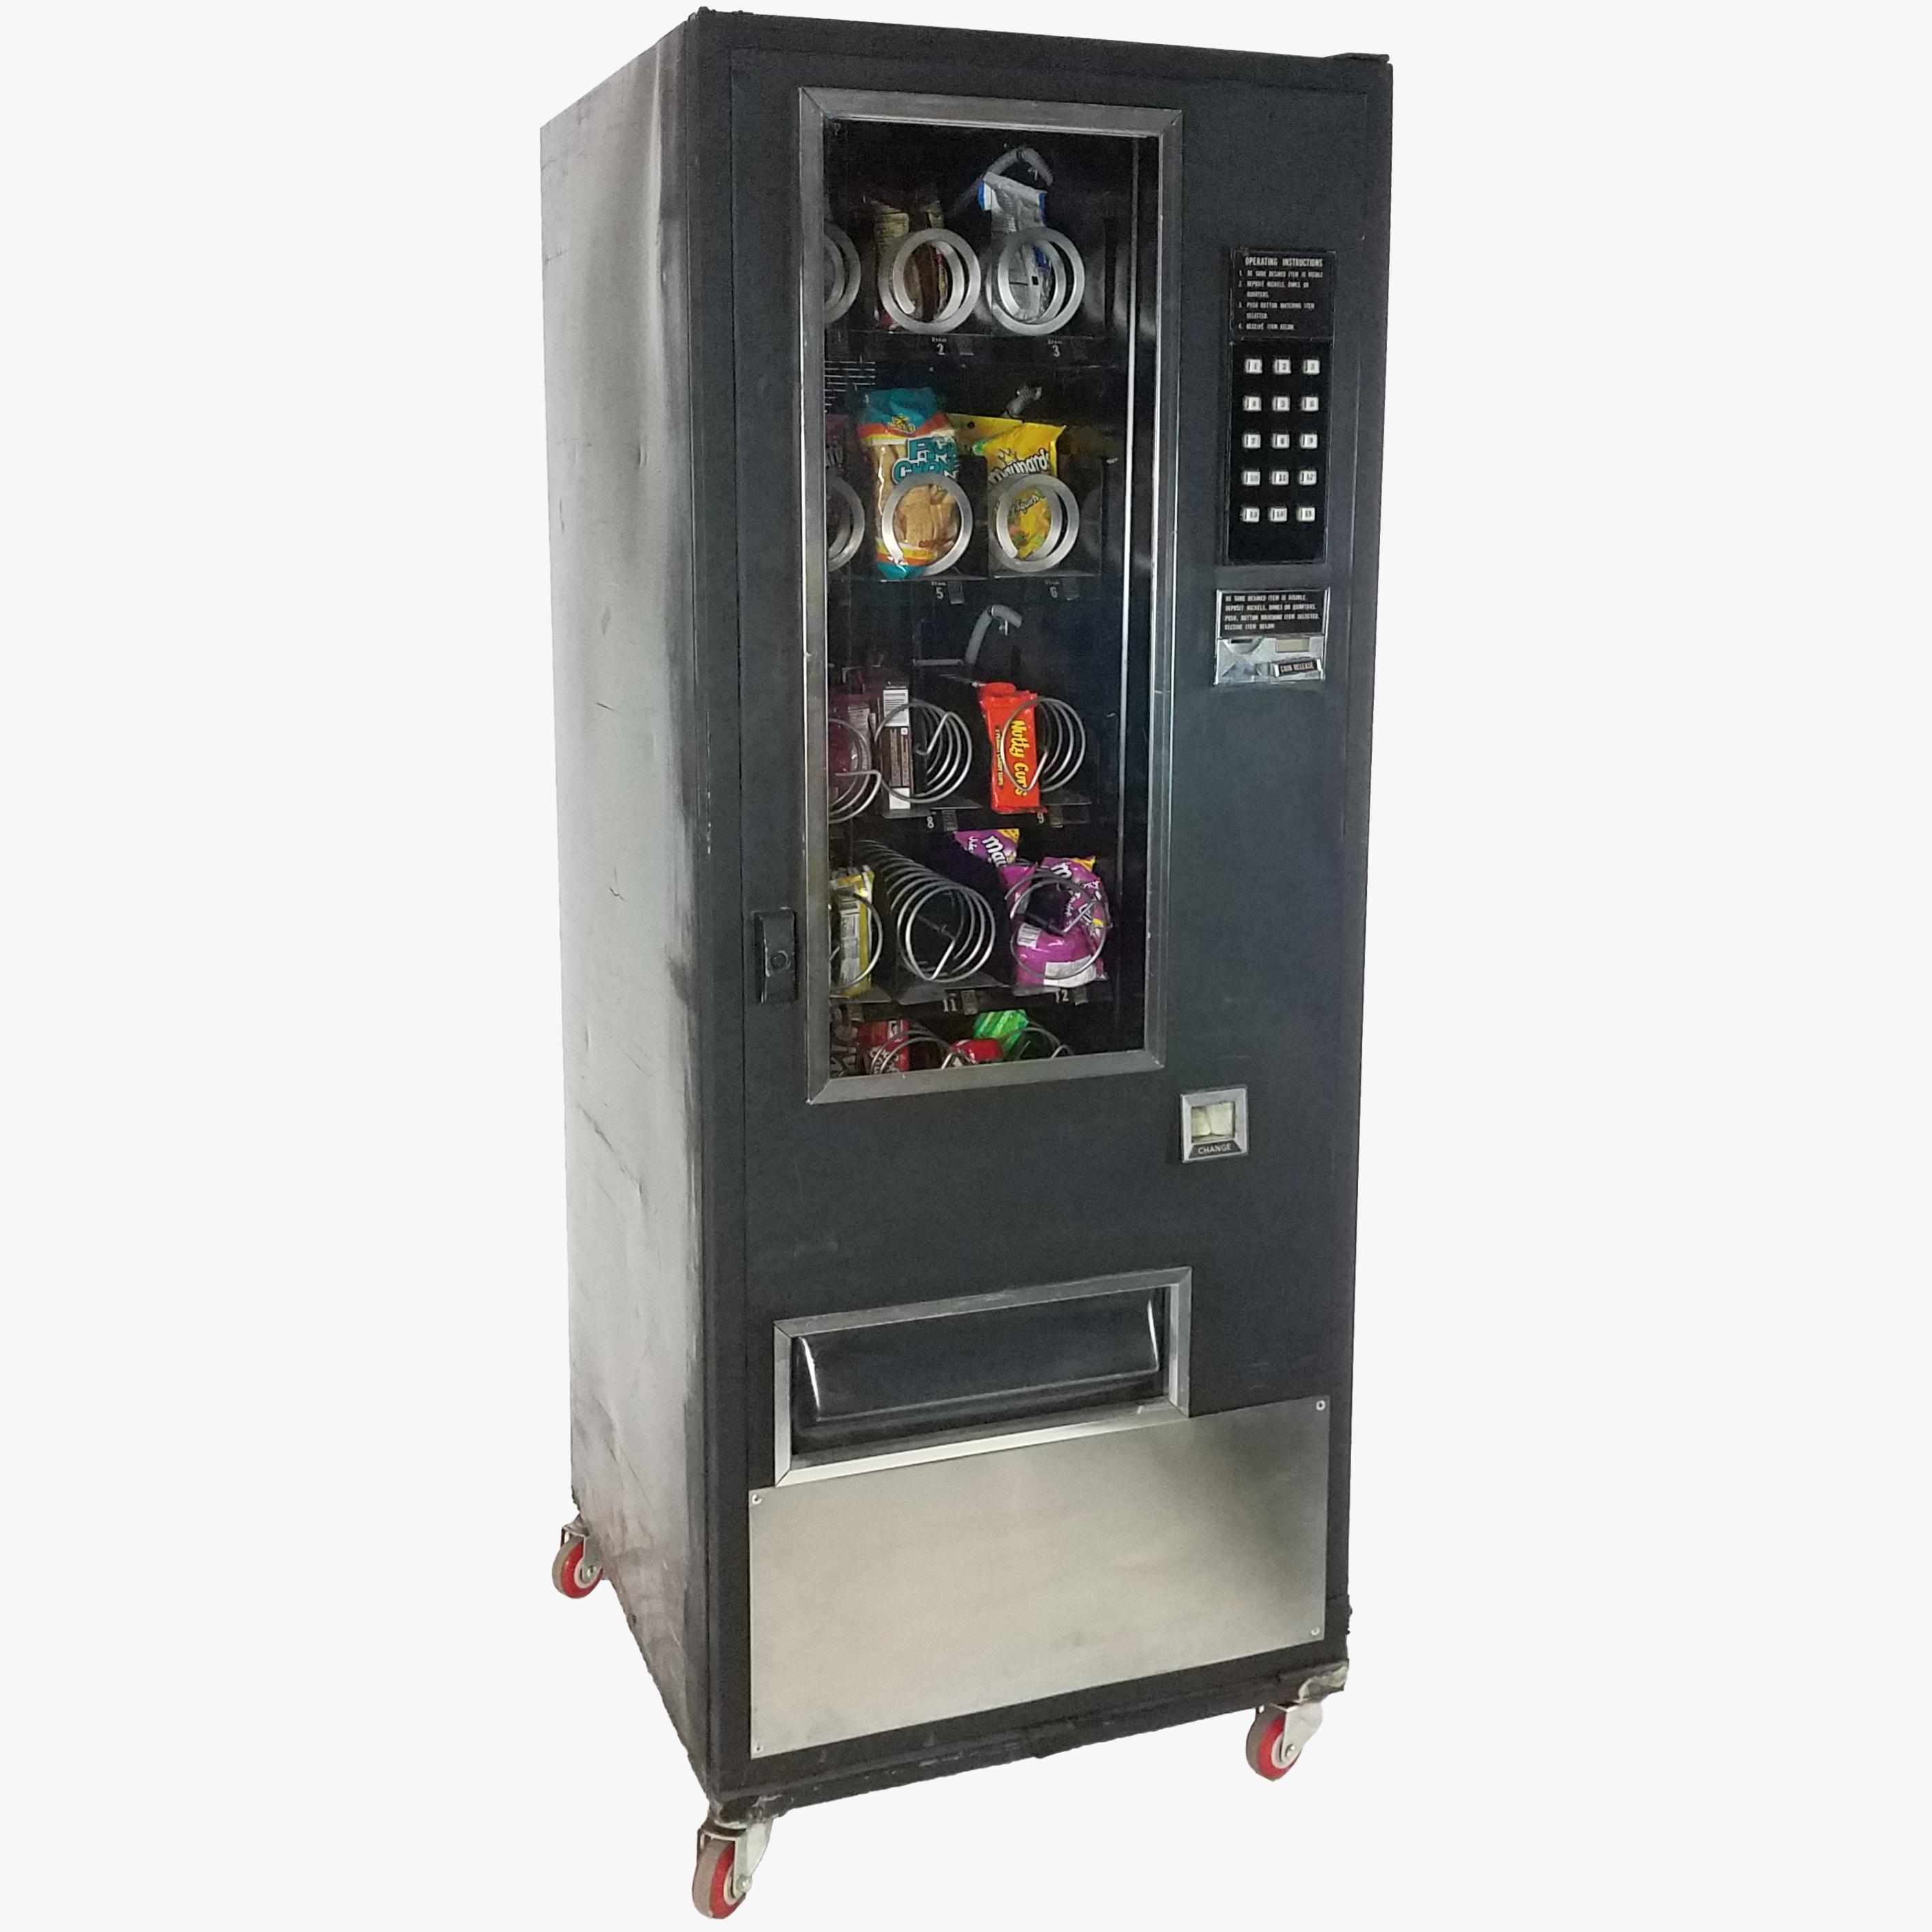 vending machine snack candy black silver narrow air designs